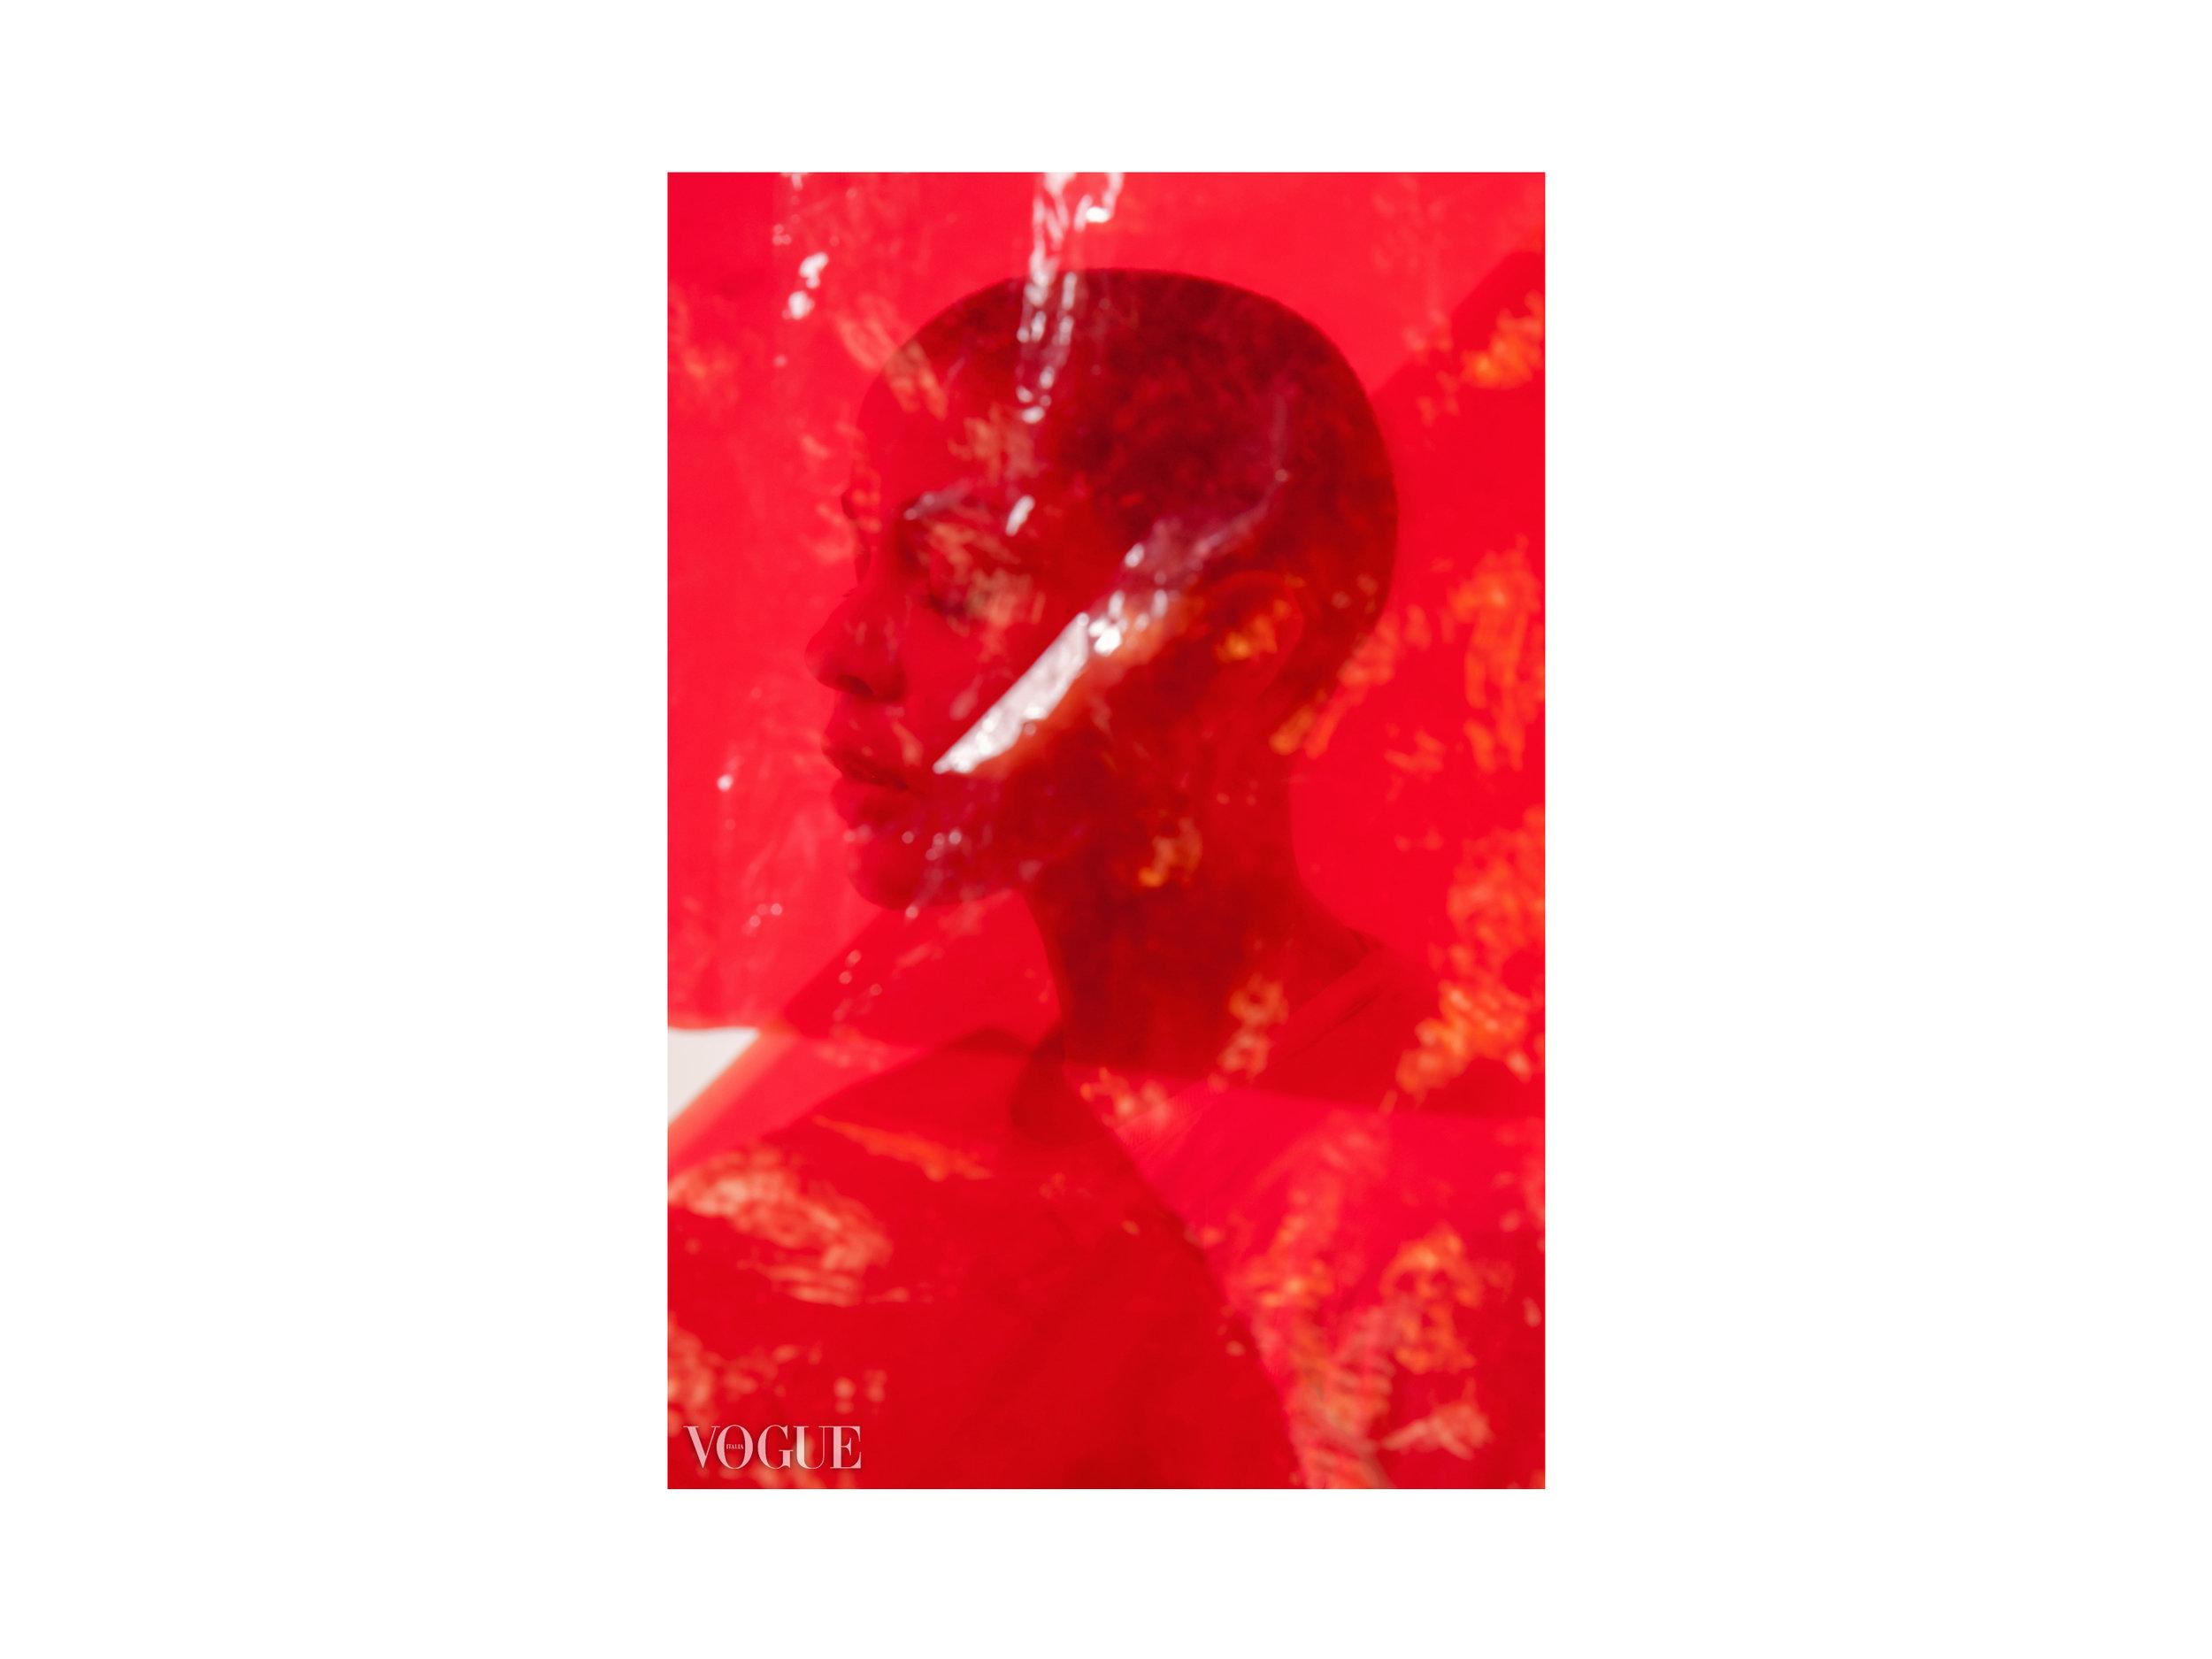 Poppy-Lafond-Red-Brinke-&-Seiffert-Collaboration-Berlin-Matthew-Coleman-Photography.jpg